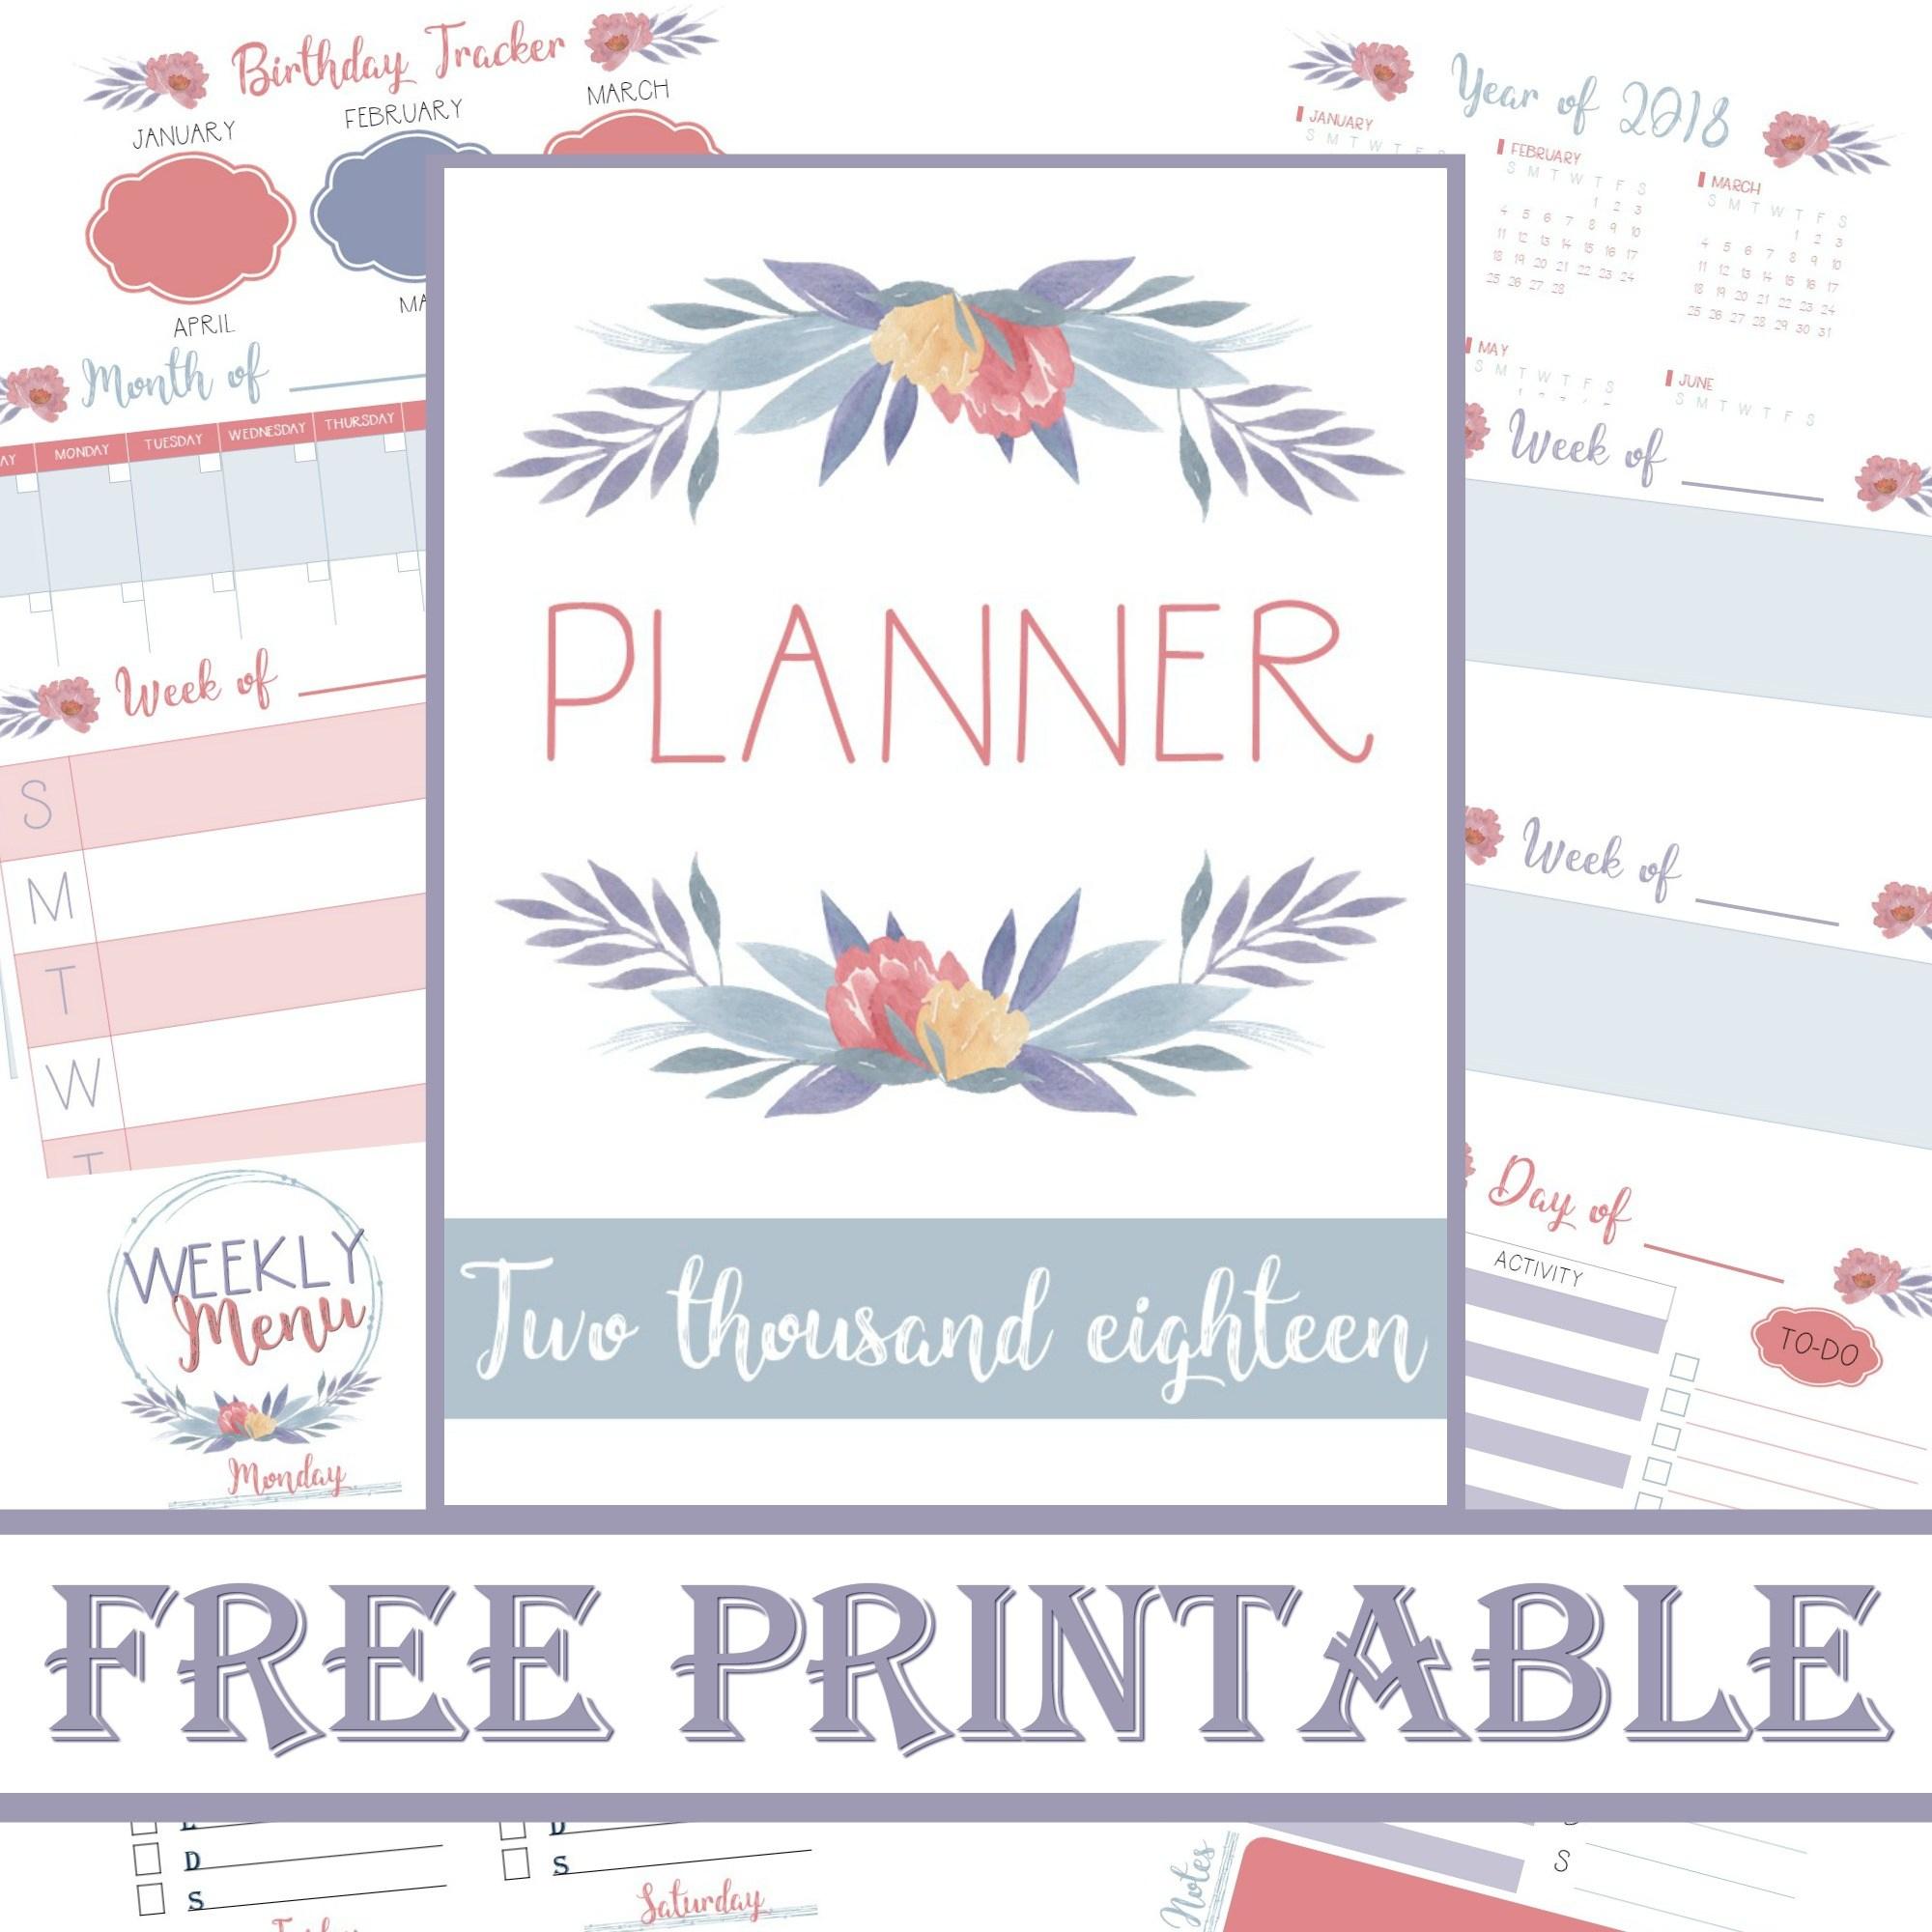 Planner 2018 | Free Printable Calander | Meal Planner | Save Money - Planner 2018 Printable Free